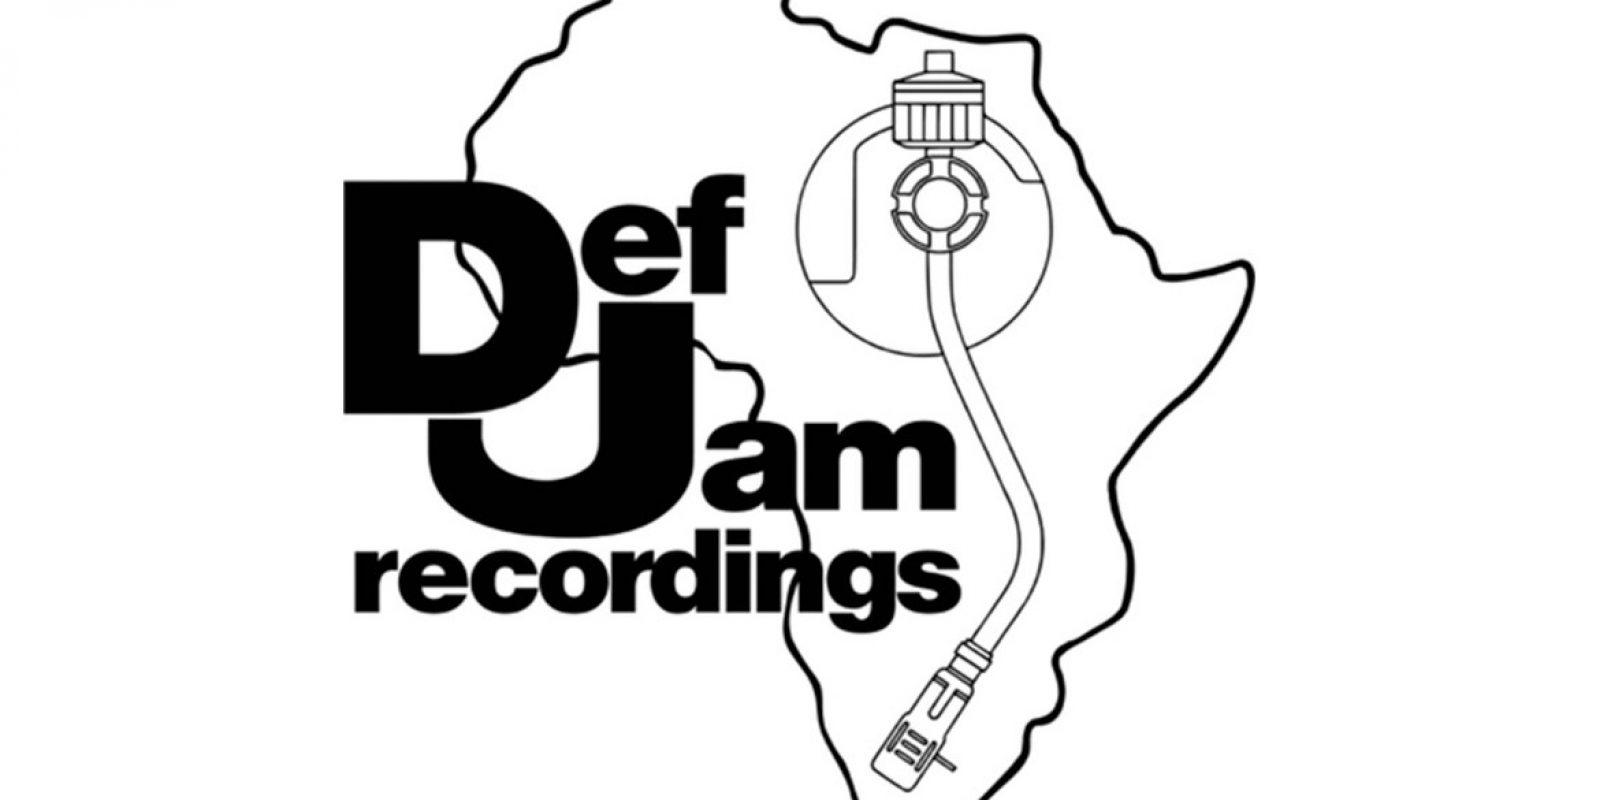 https___hypebeast.com_image_2020_05_universal-music-group-def-jam-africa-launch-1